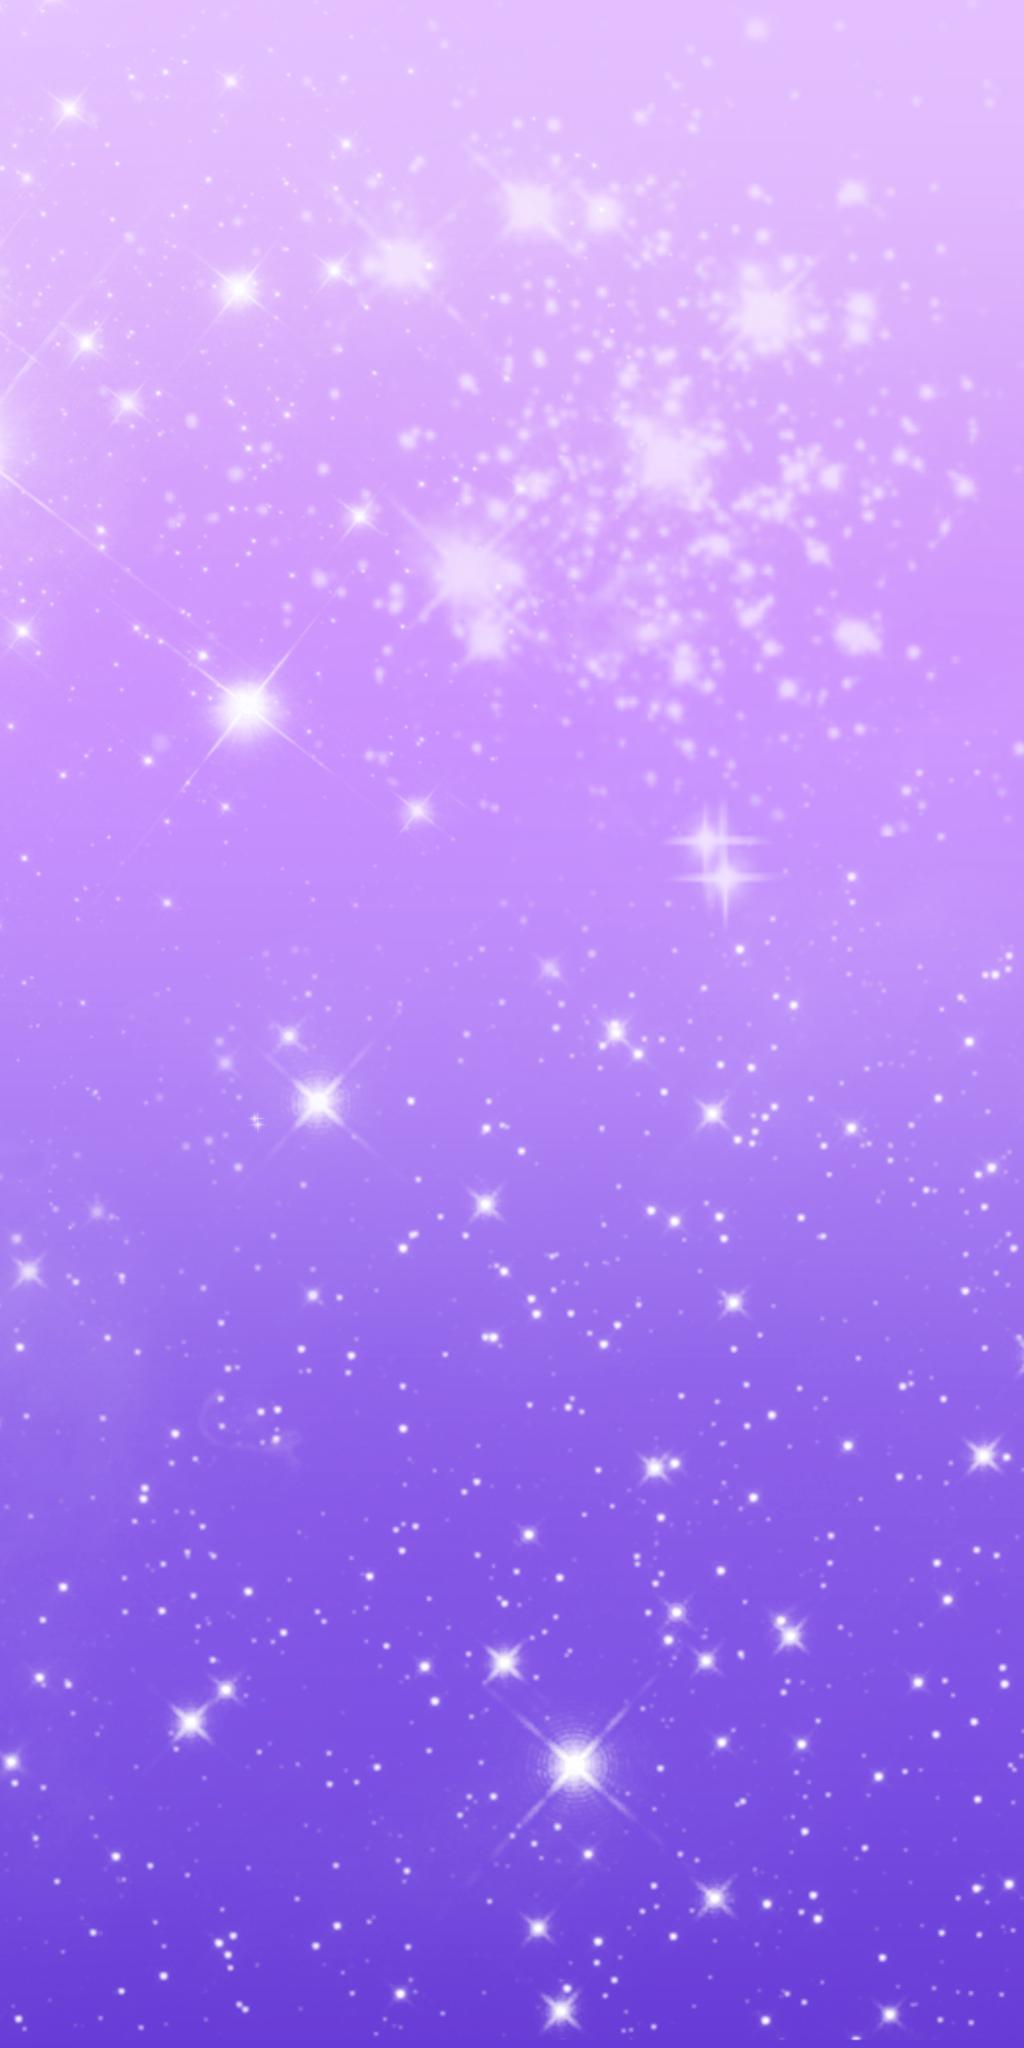 Custom Box Background Purple Sparkles by SpookyBjorn 1024x2048